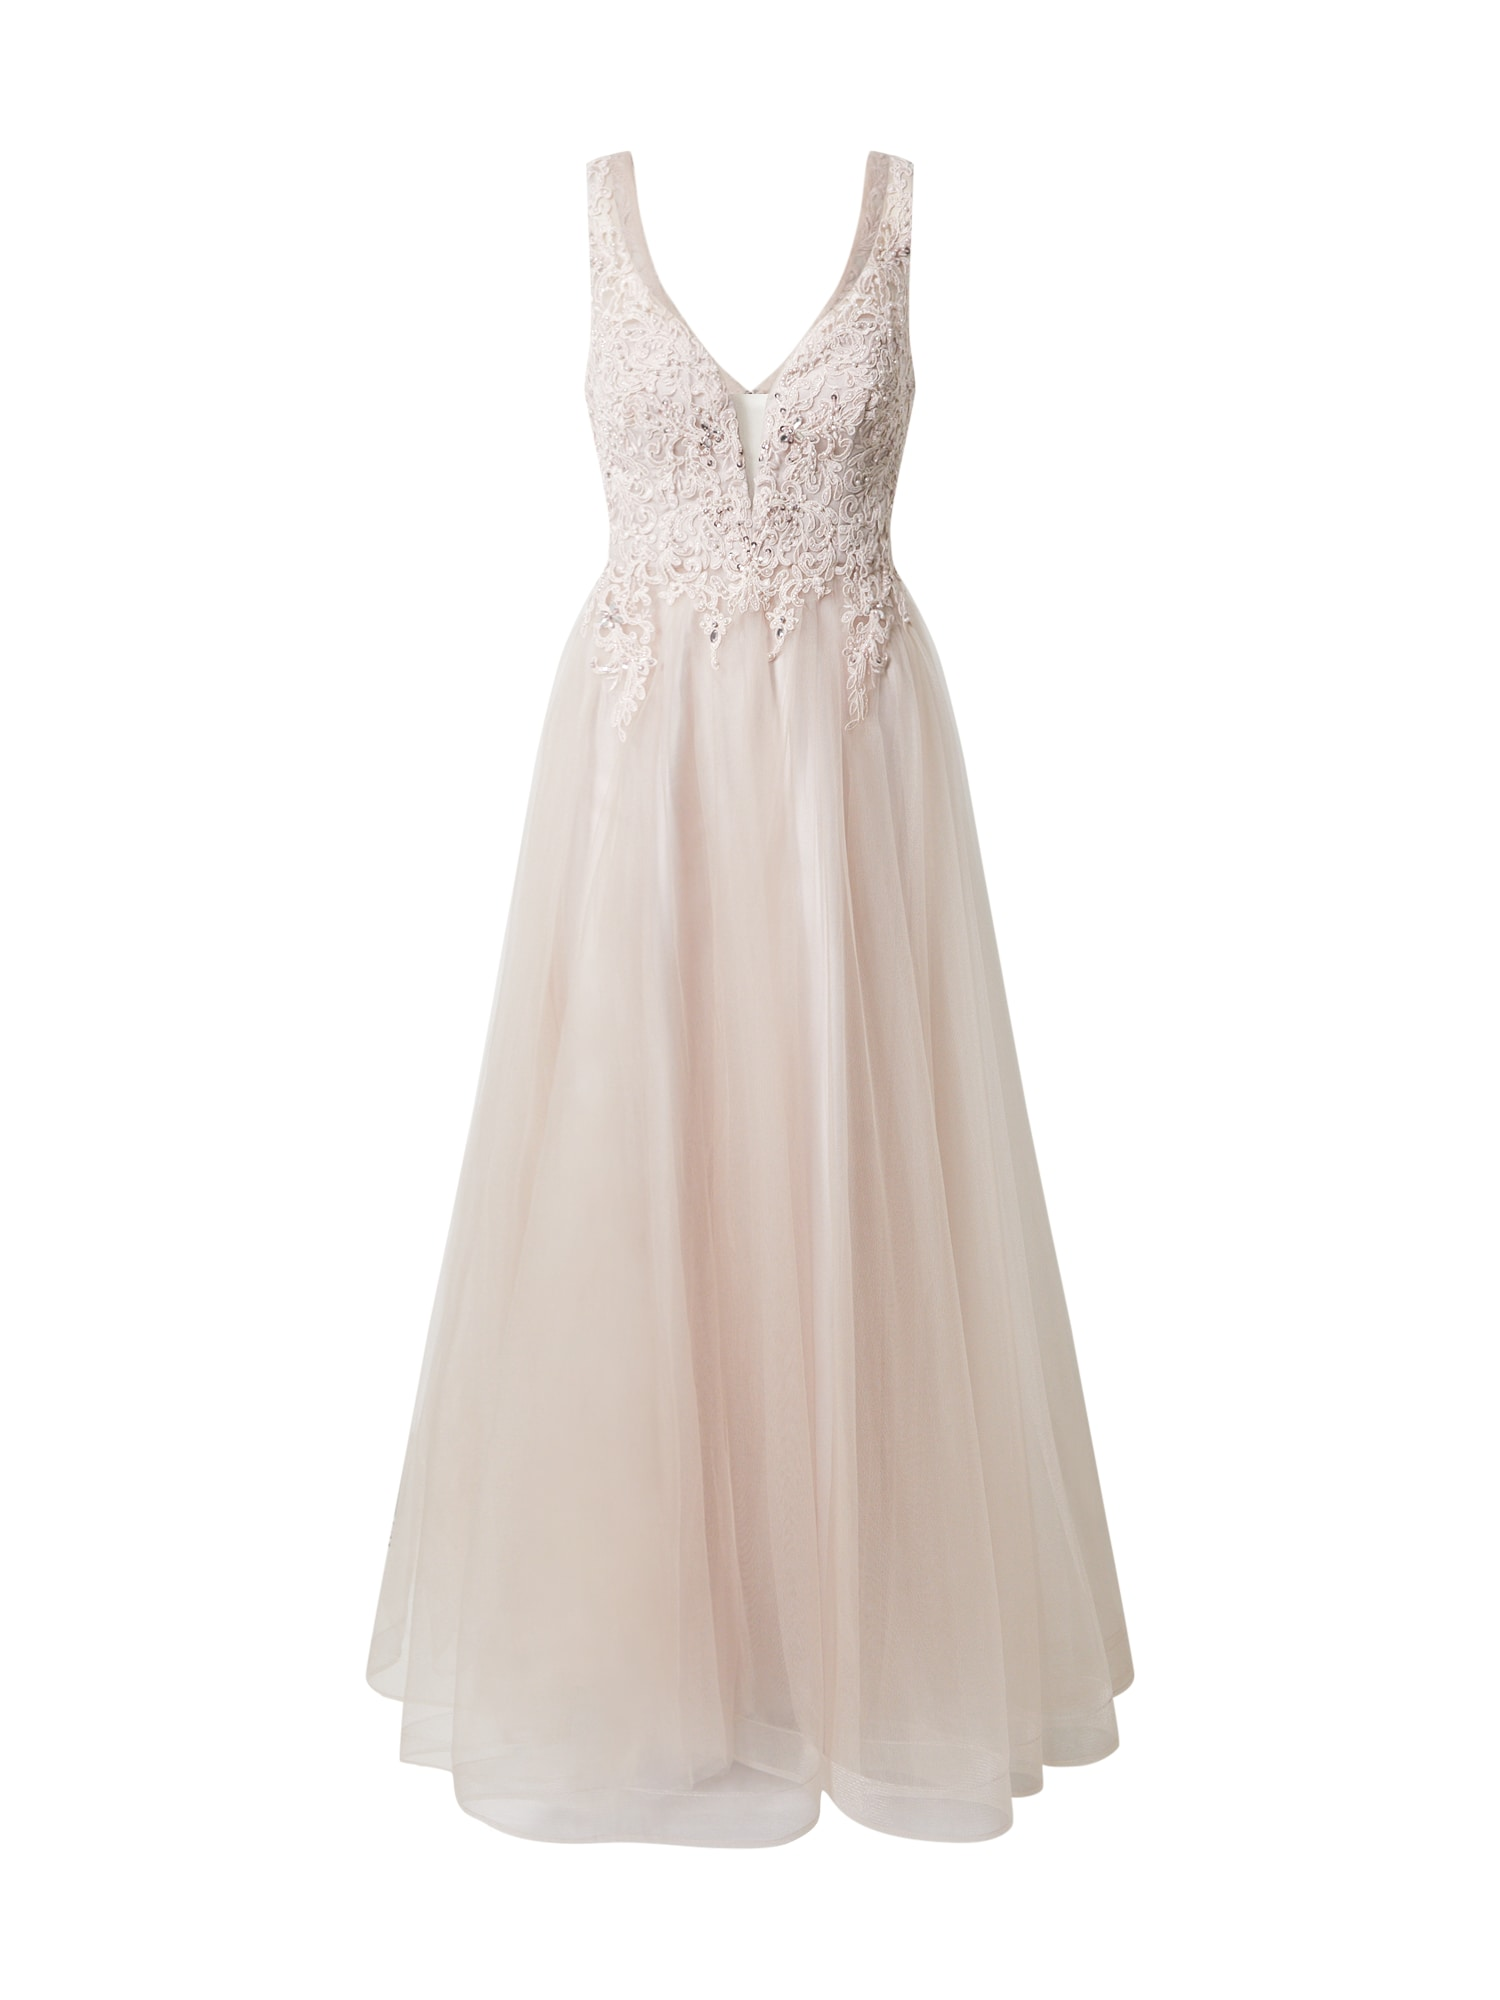 Unique Suknelė šampano